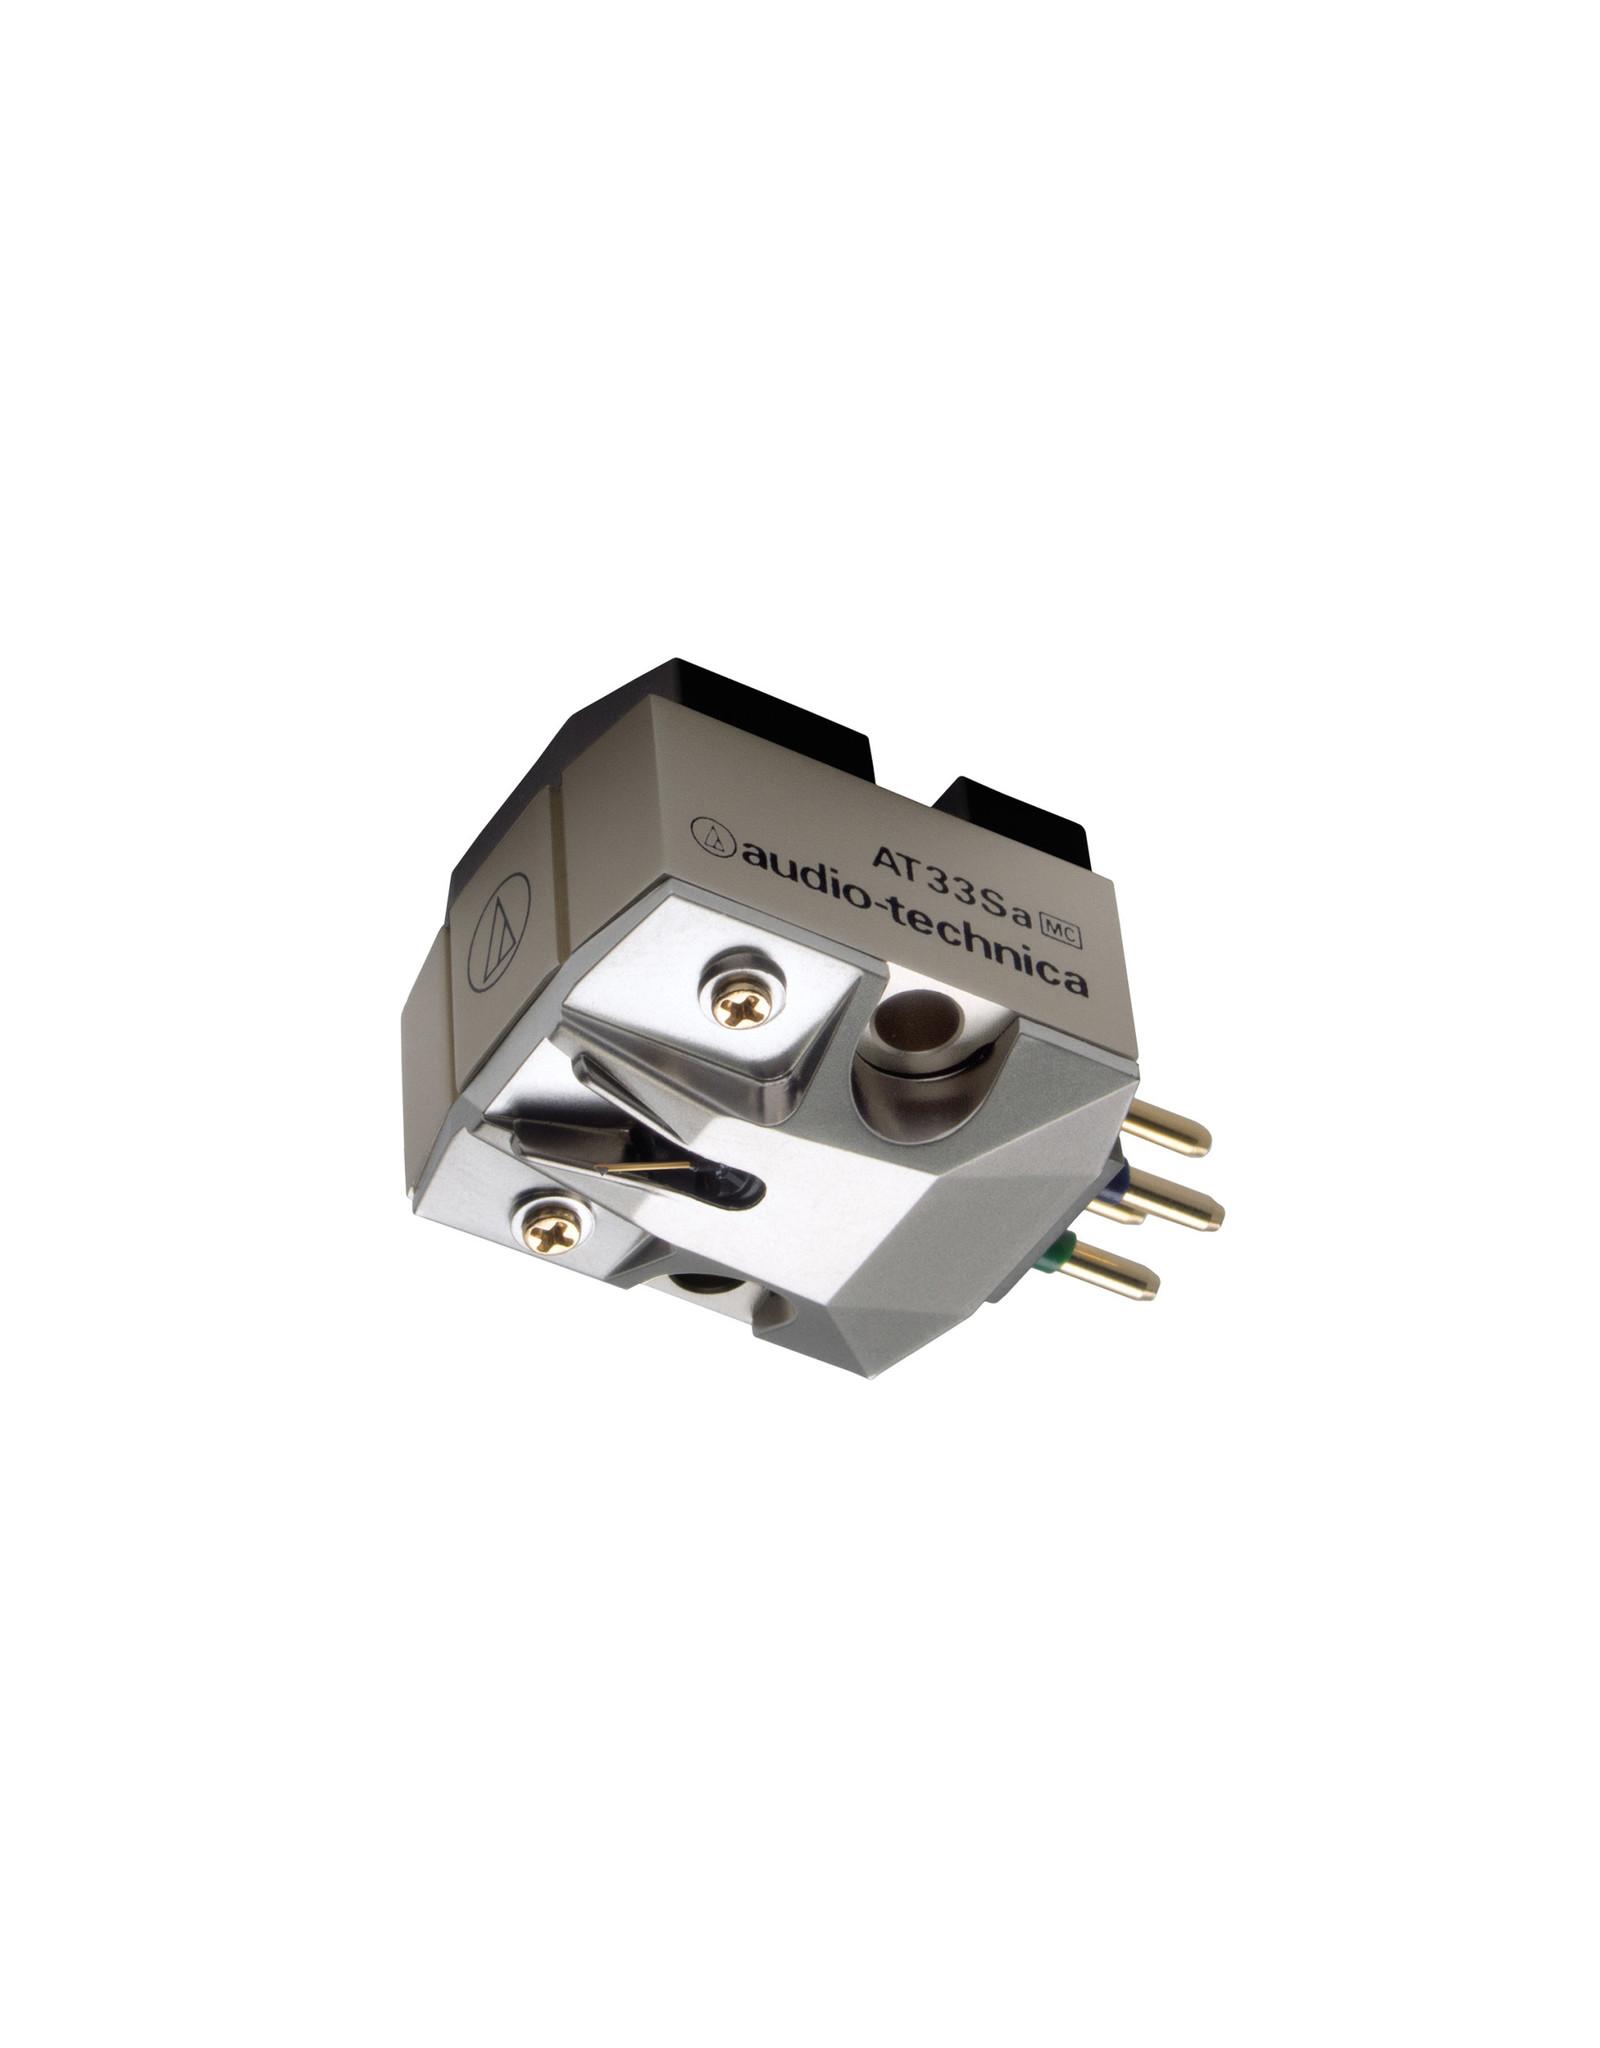 Audio-Technica Audio-Technica AT33Sa MC Phono Cartridge